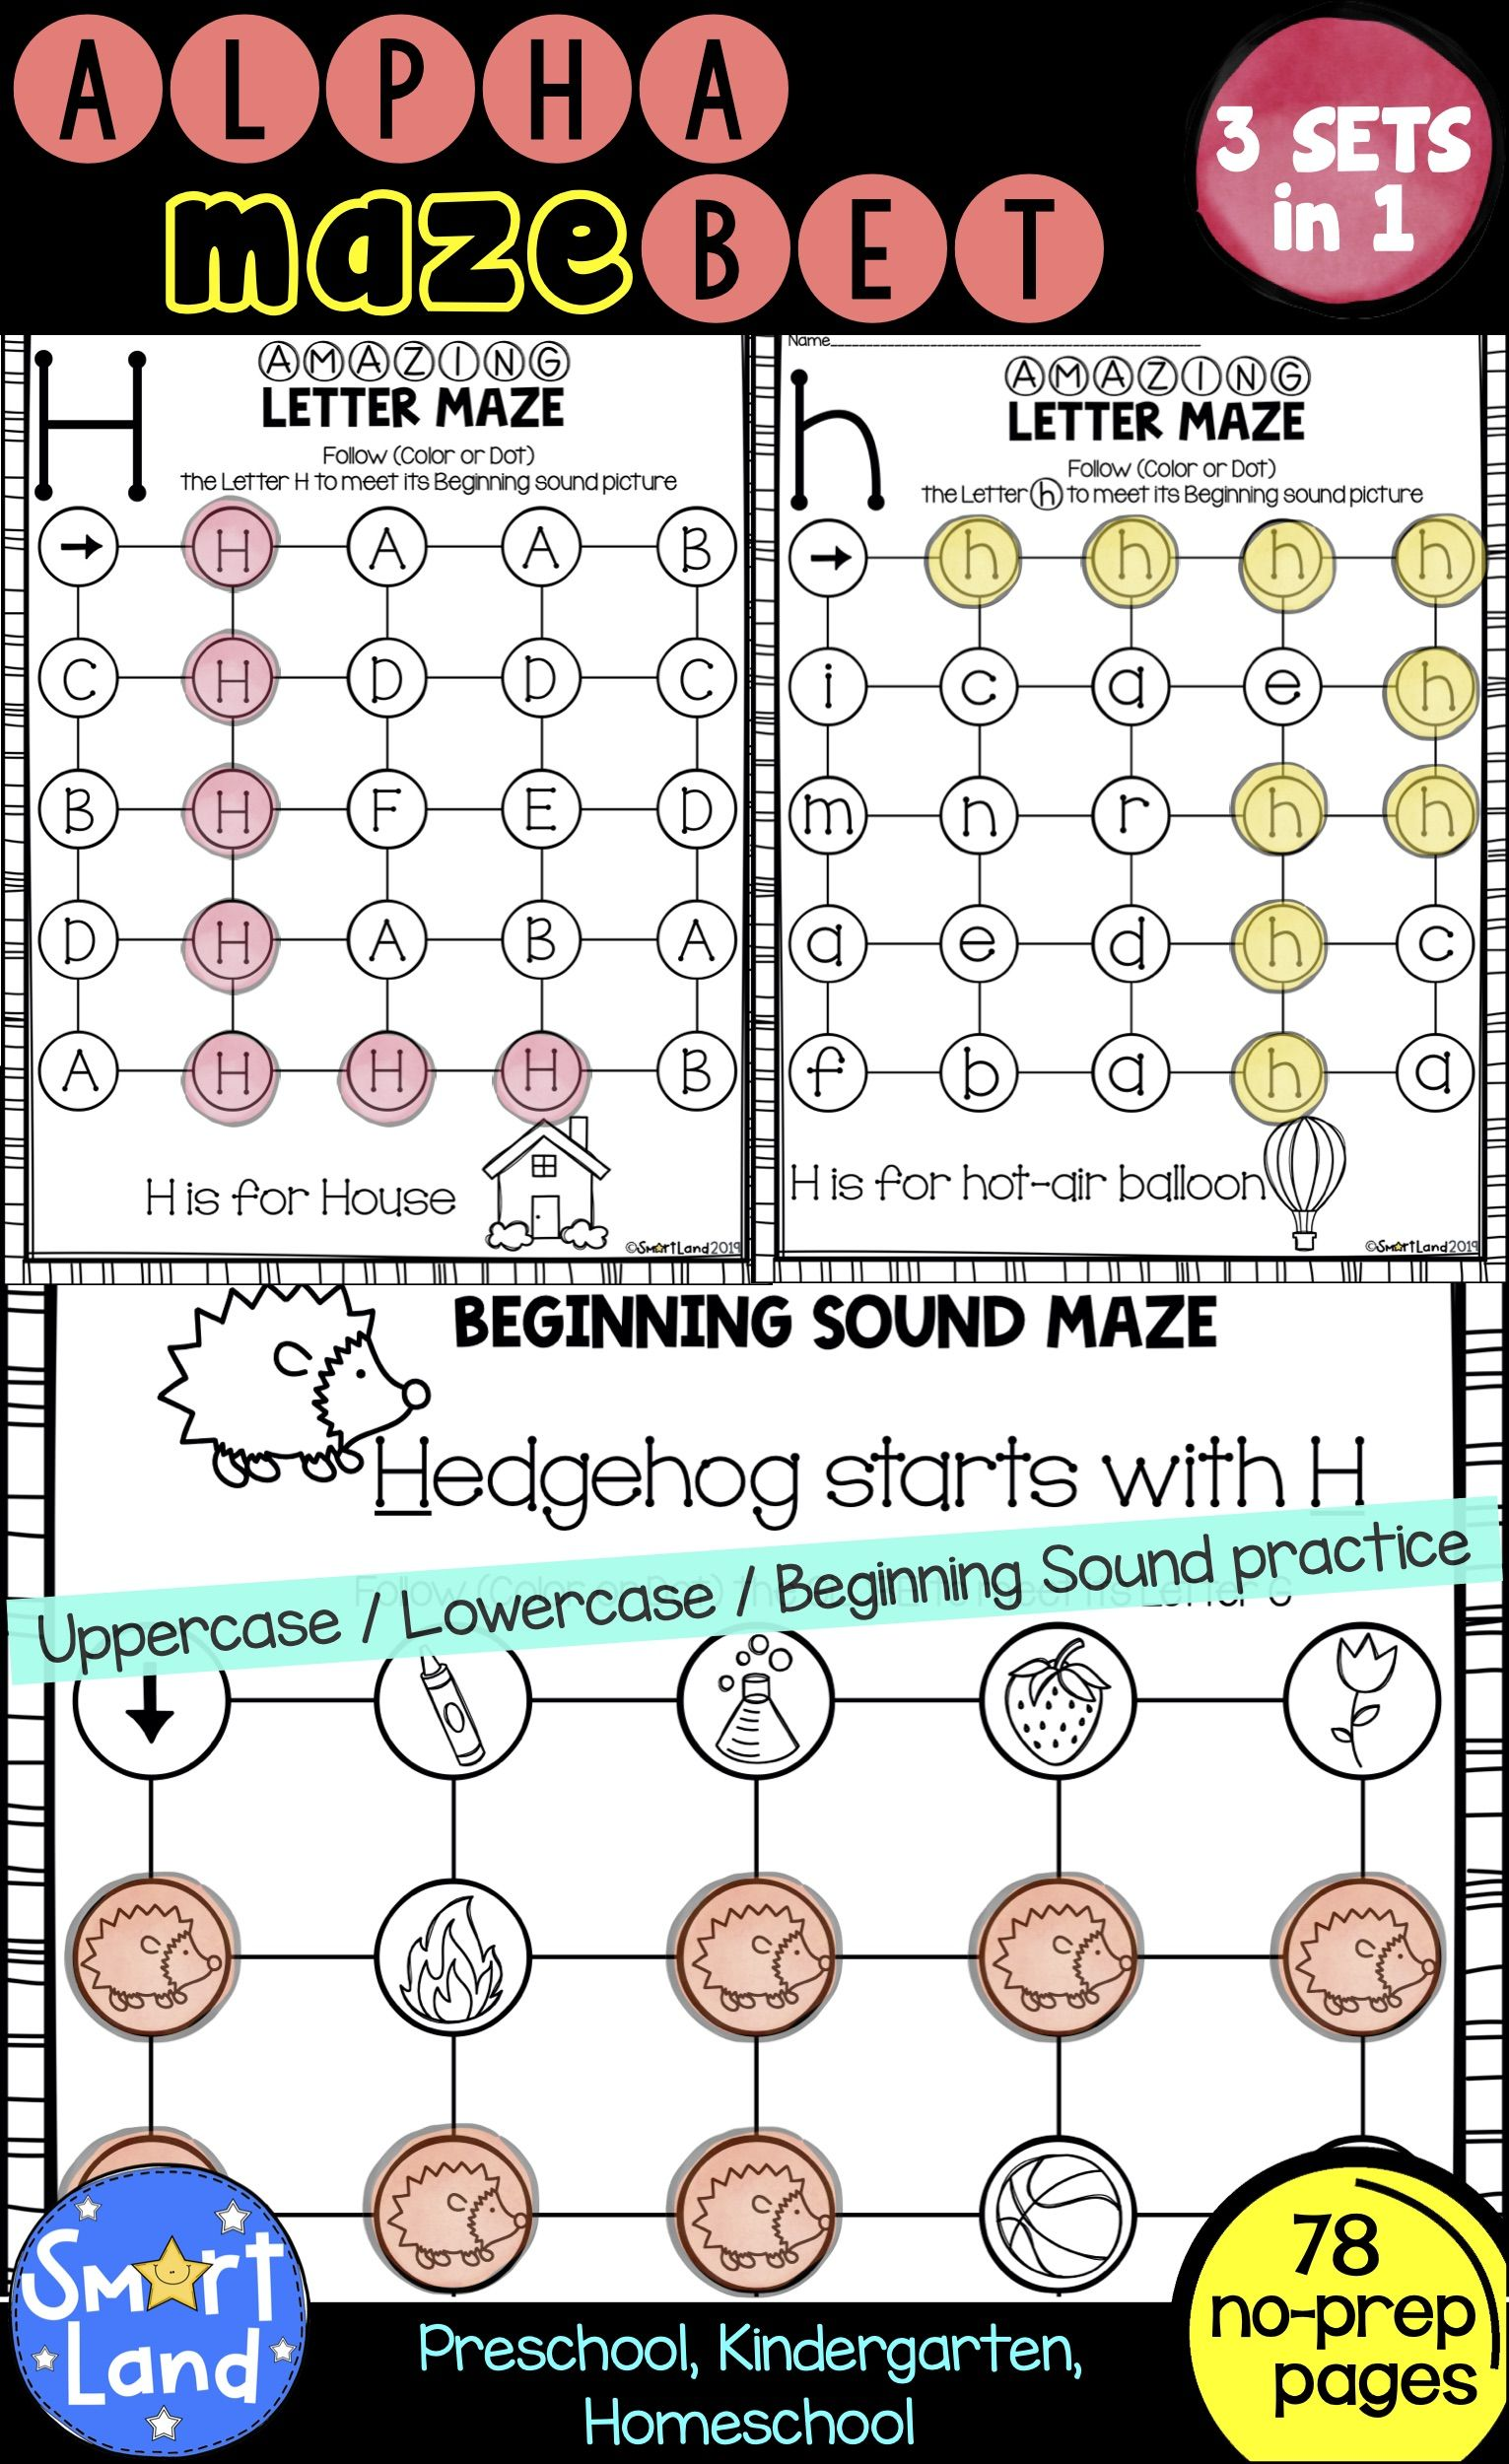 Alphabet Practice 3sets Of Letter Mazes